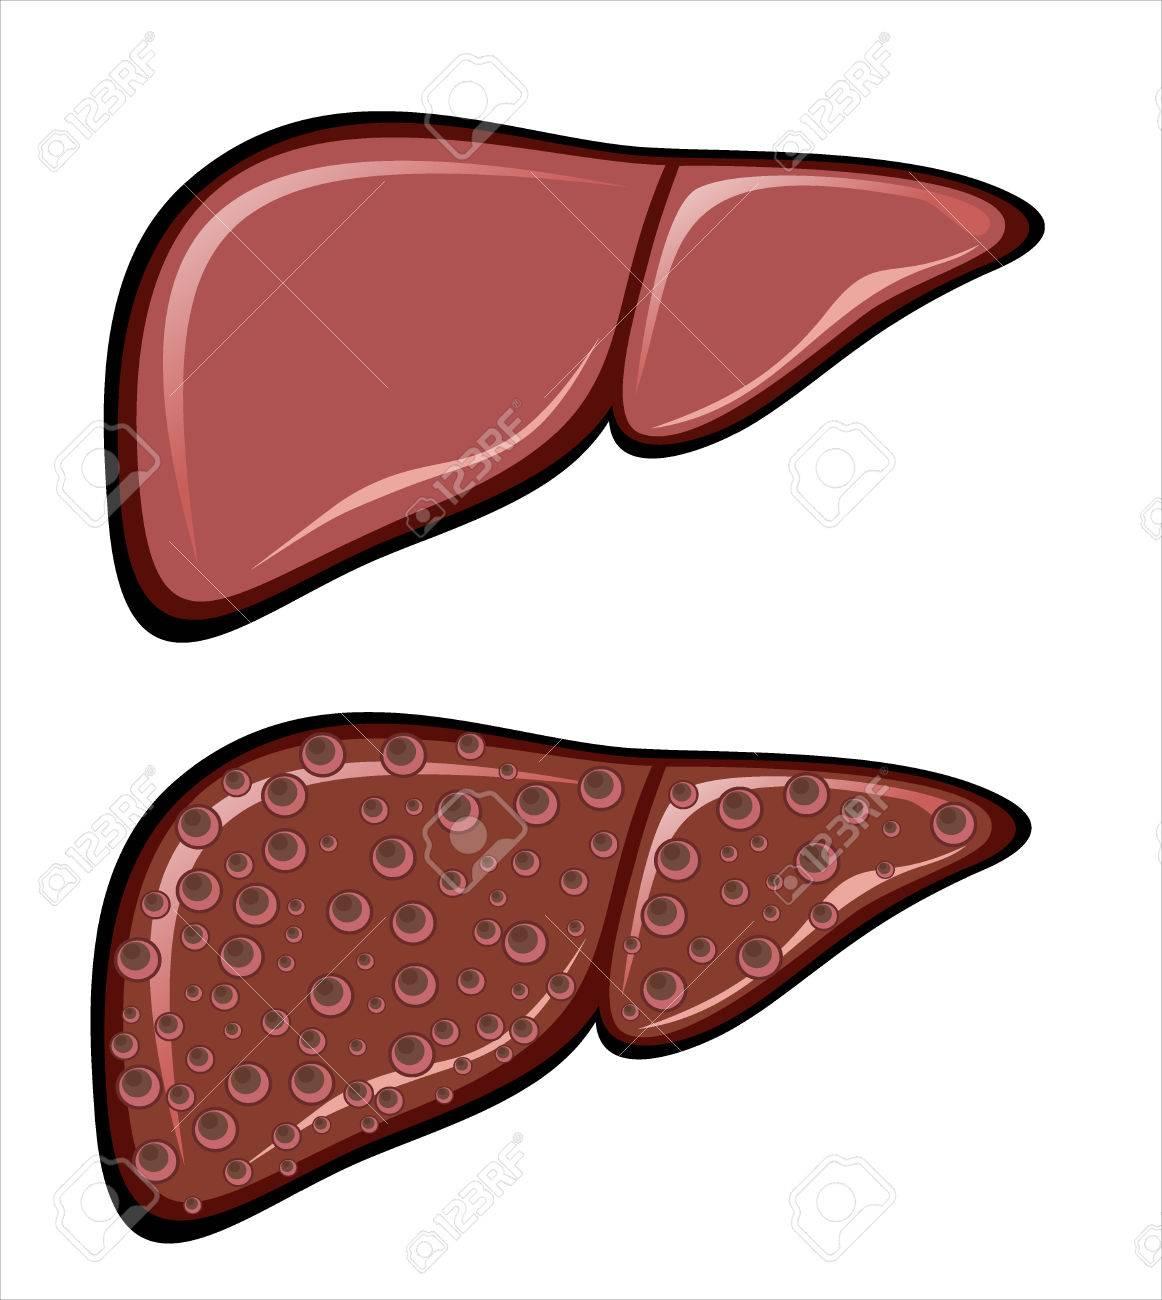 Liver Cirrhosis disease - 25152857